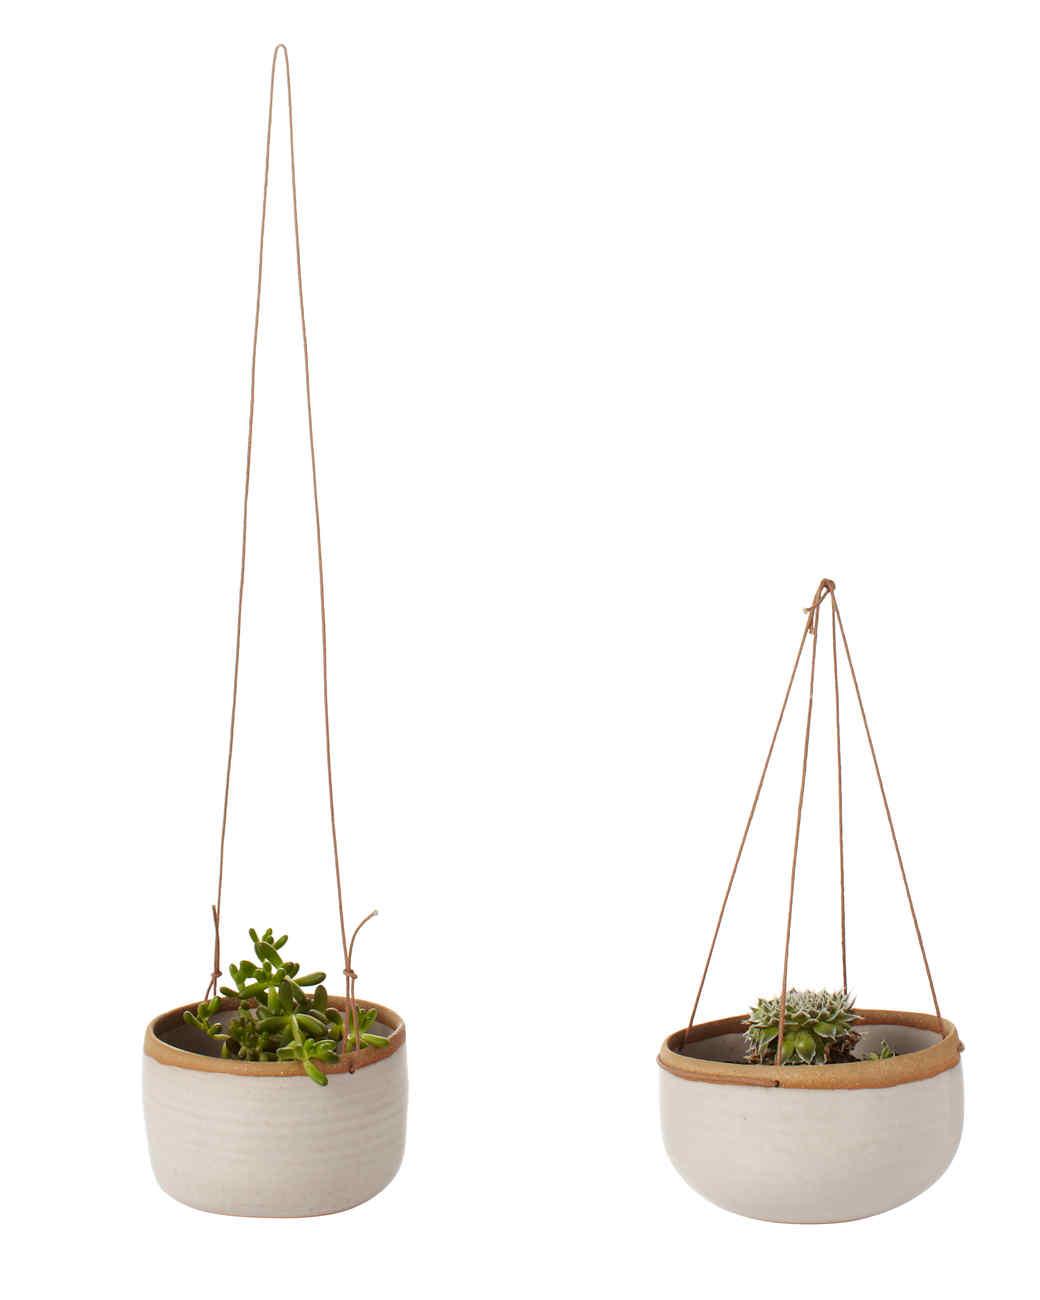 hanging-ceramic-planters-107-ld110668.jpg